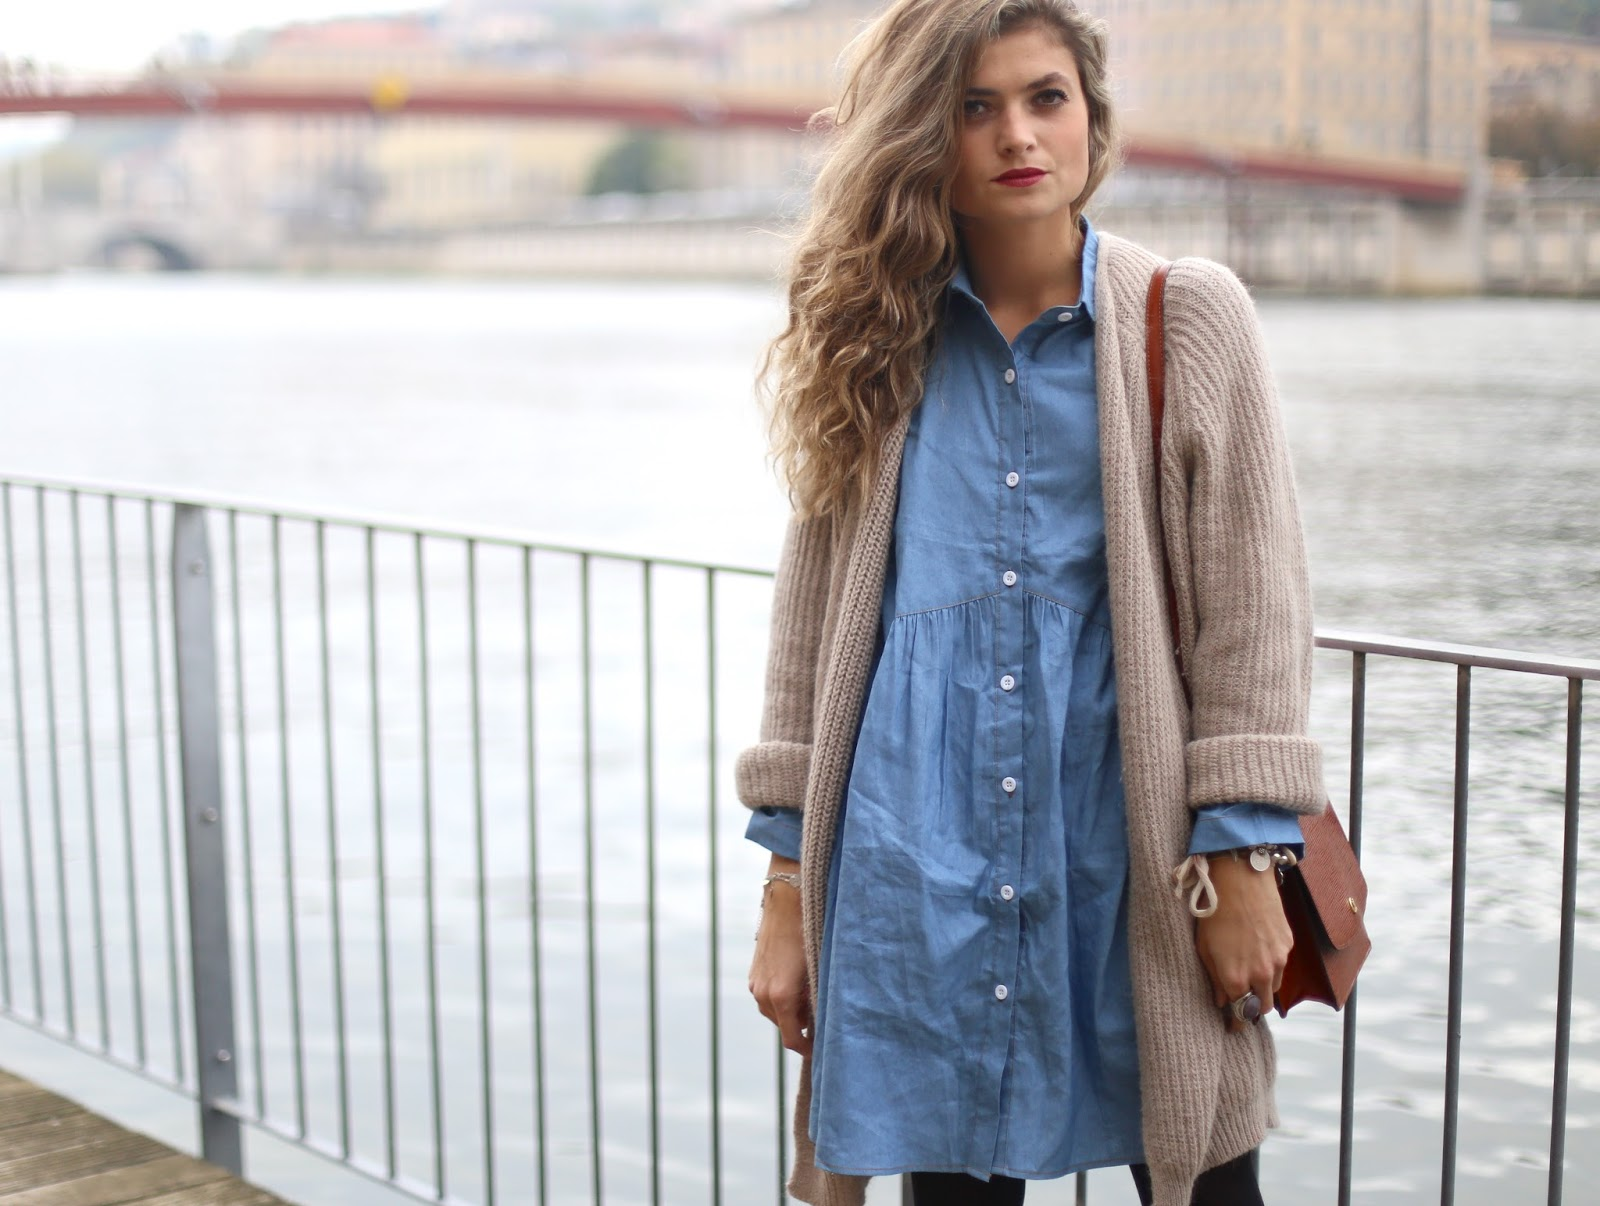 Robe en jean en hiver